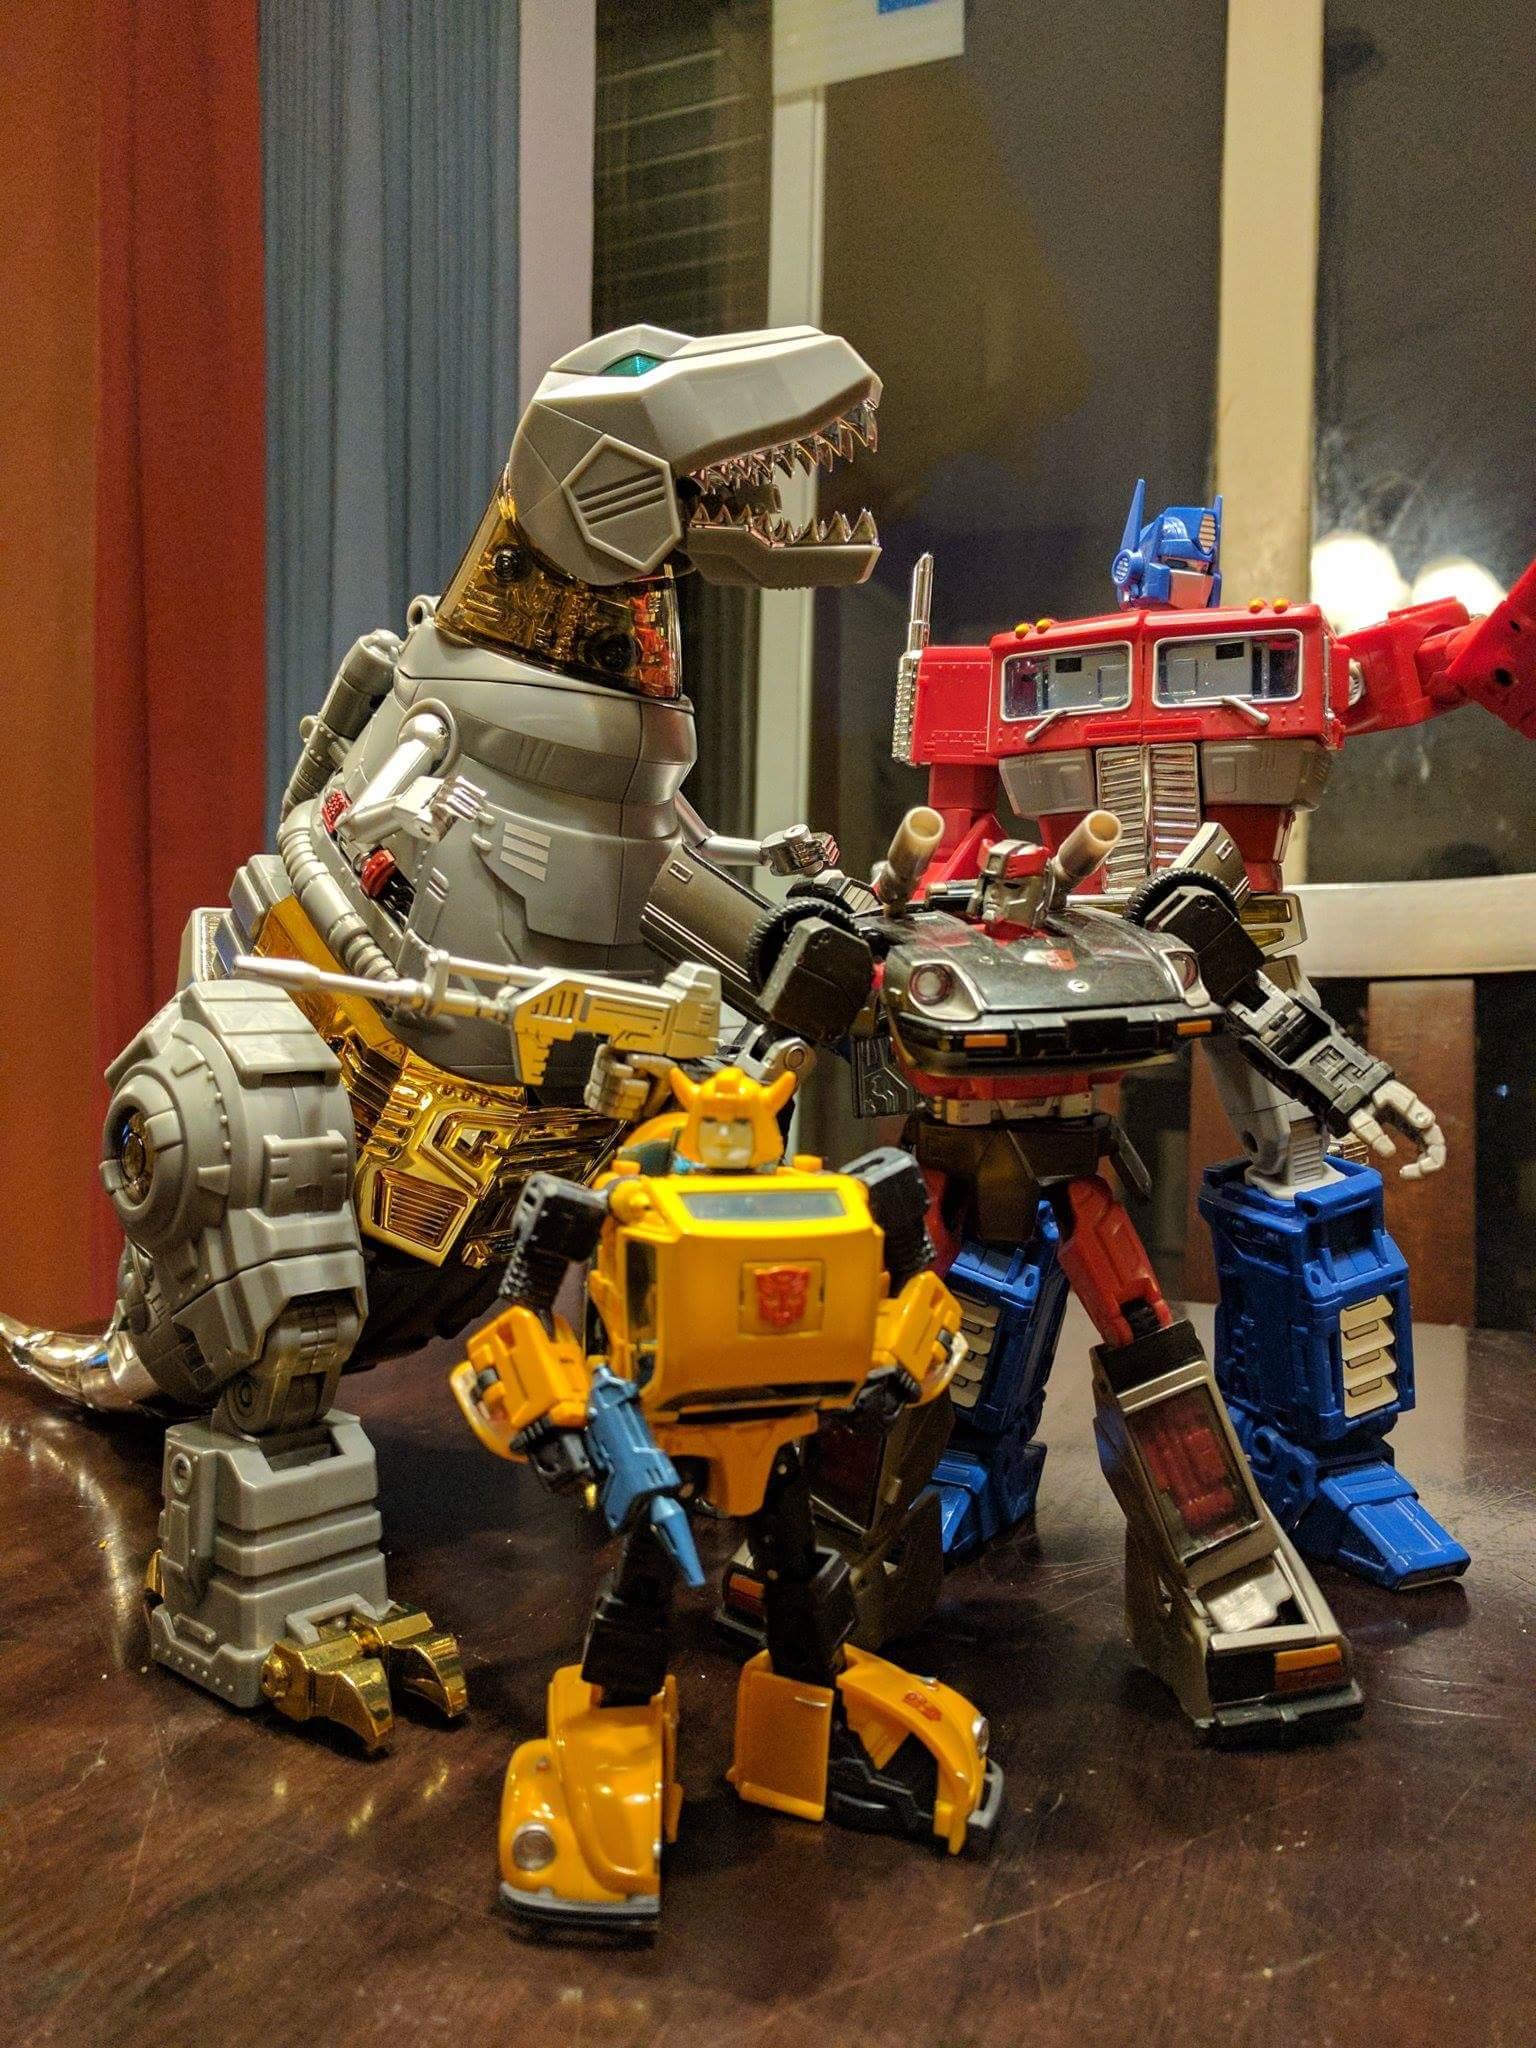 [Fanstoys] Produit Tiers - Dinobots - FT-04 Scoria, FT-05 Soar, FT-06 Sever, FT-07 Stomp, FT-08 Grinder - Page 12 6hTSmx96